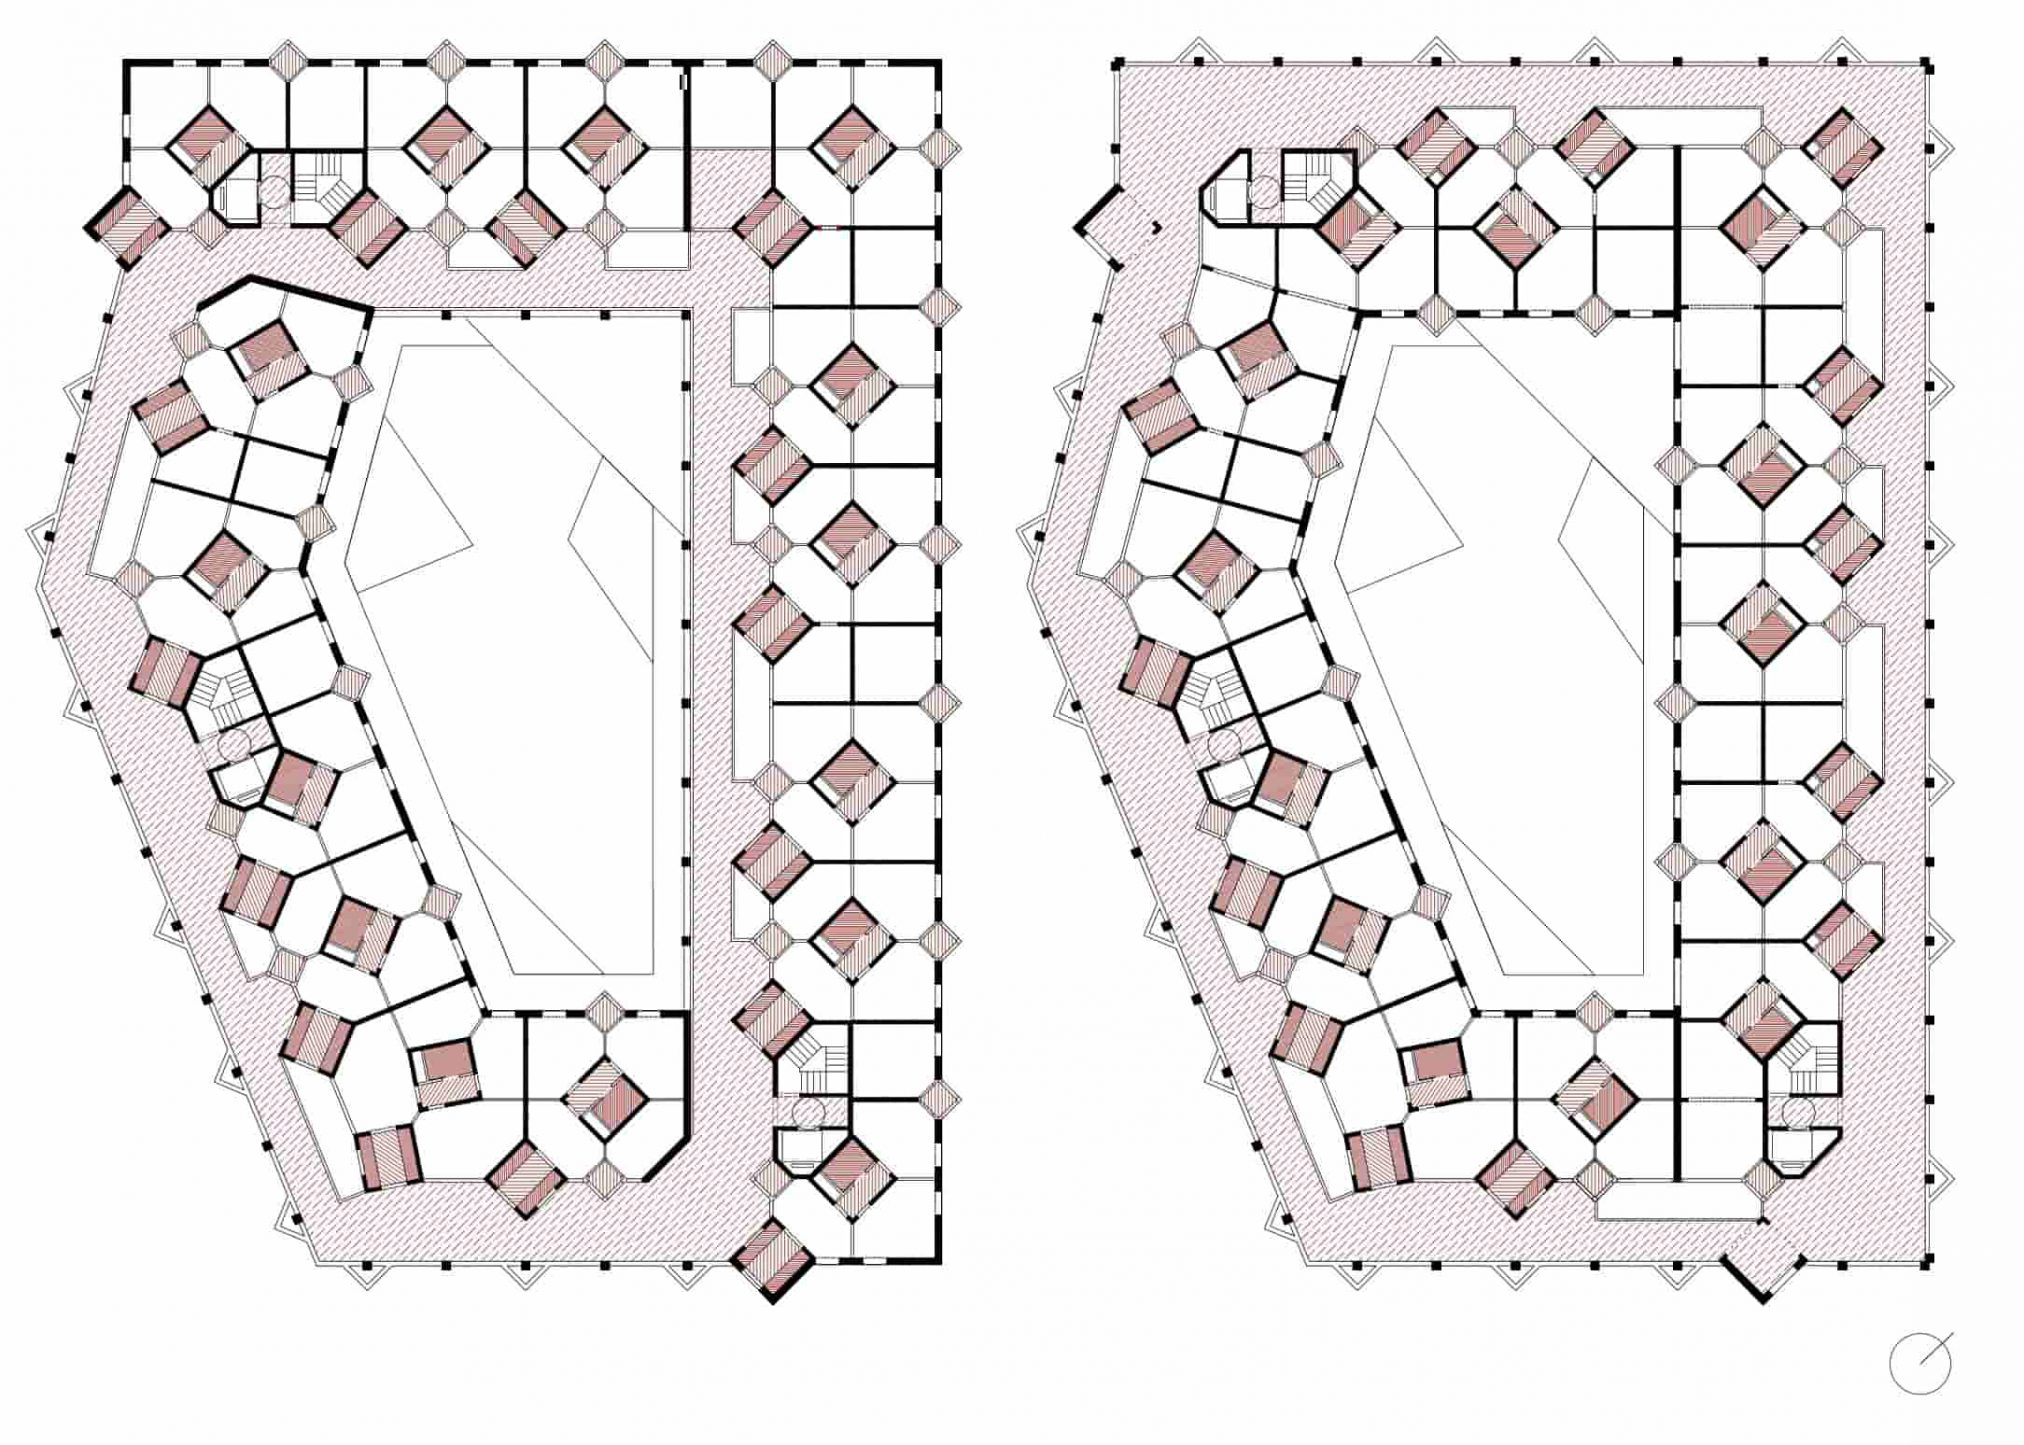 planta-edificio-viviendas-sociales